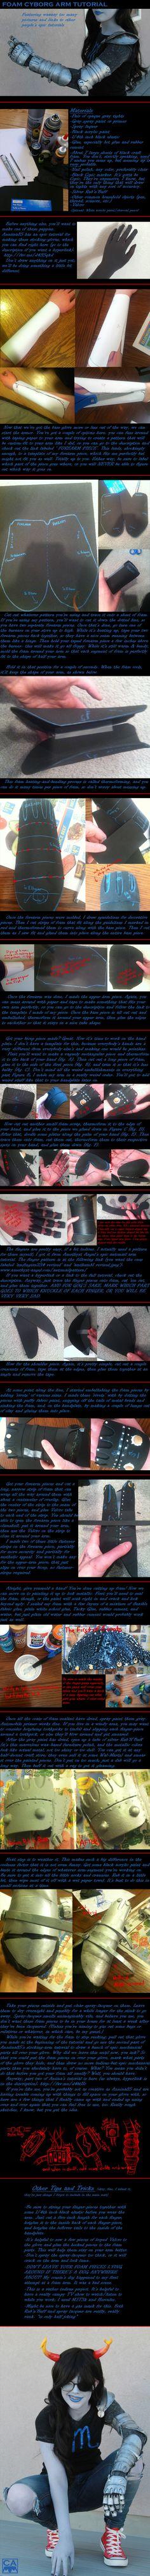 Foam Cyborg Arm Tutorial by crownless-Again.deviantart.com on @deviantART